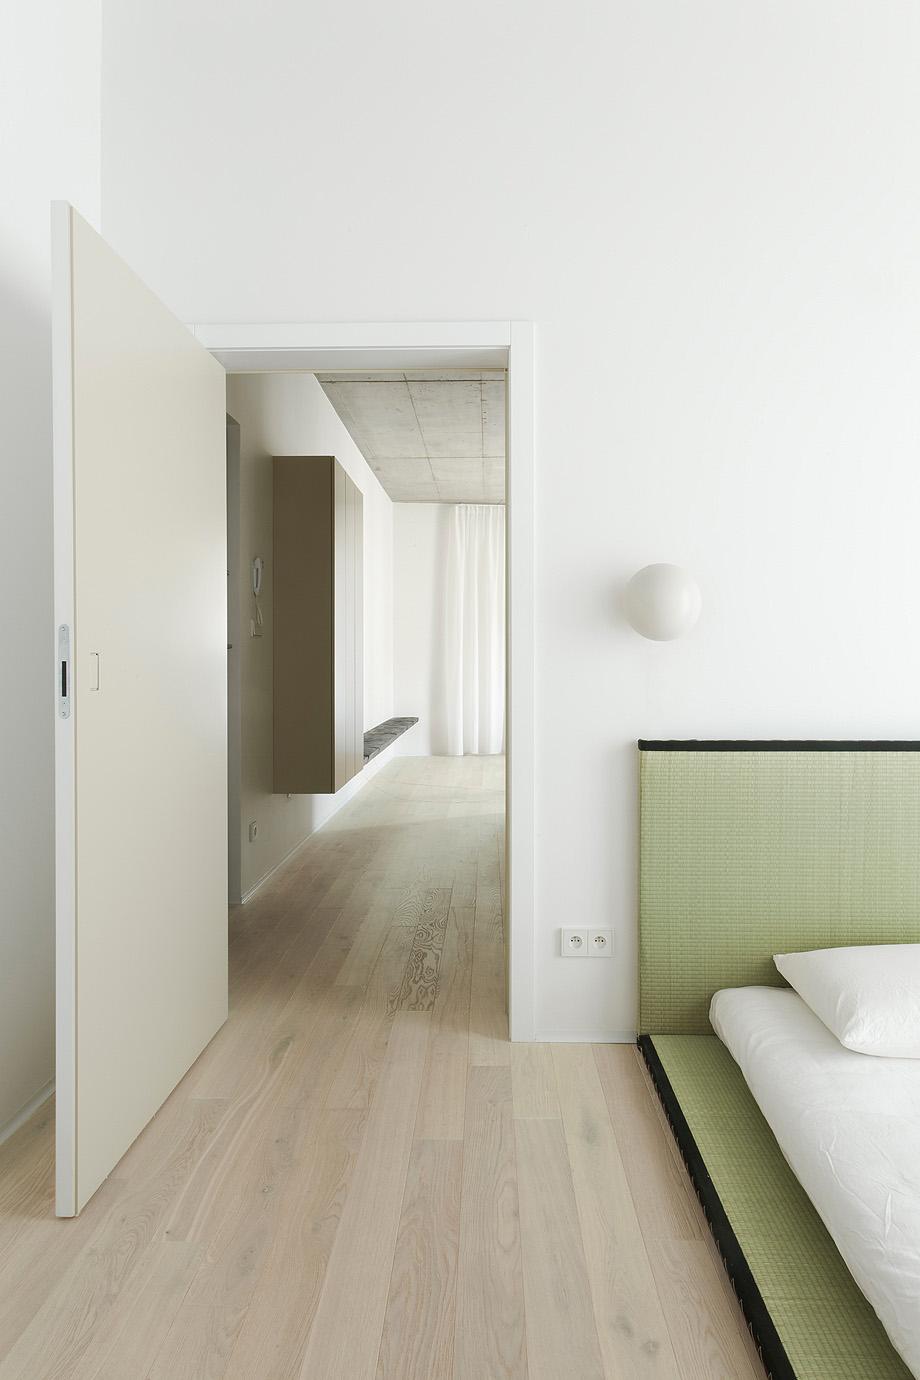 apartamento de alquiler en varsovia por thisispaper studio (16)